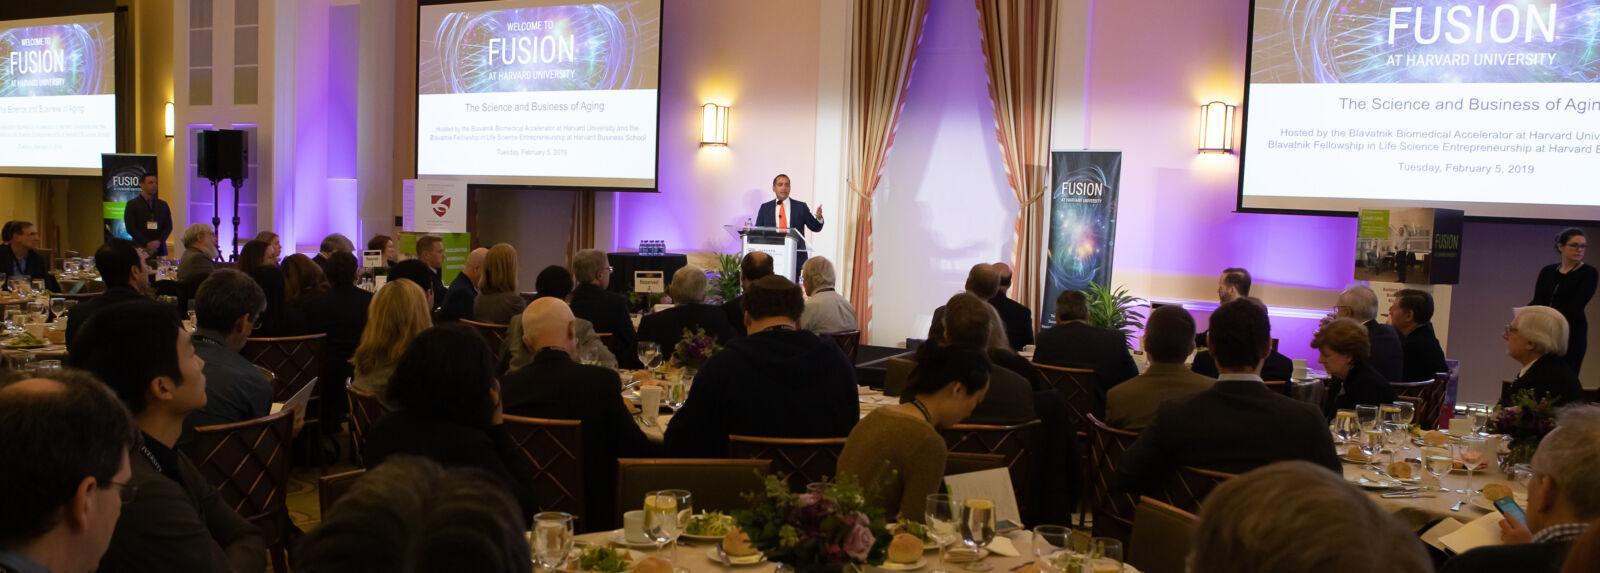 Harvard alumnus Sachin H. Jain speaks at the 2019 Fusion symposium. Image credit Russ Campbell.